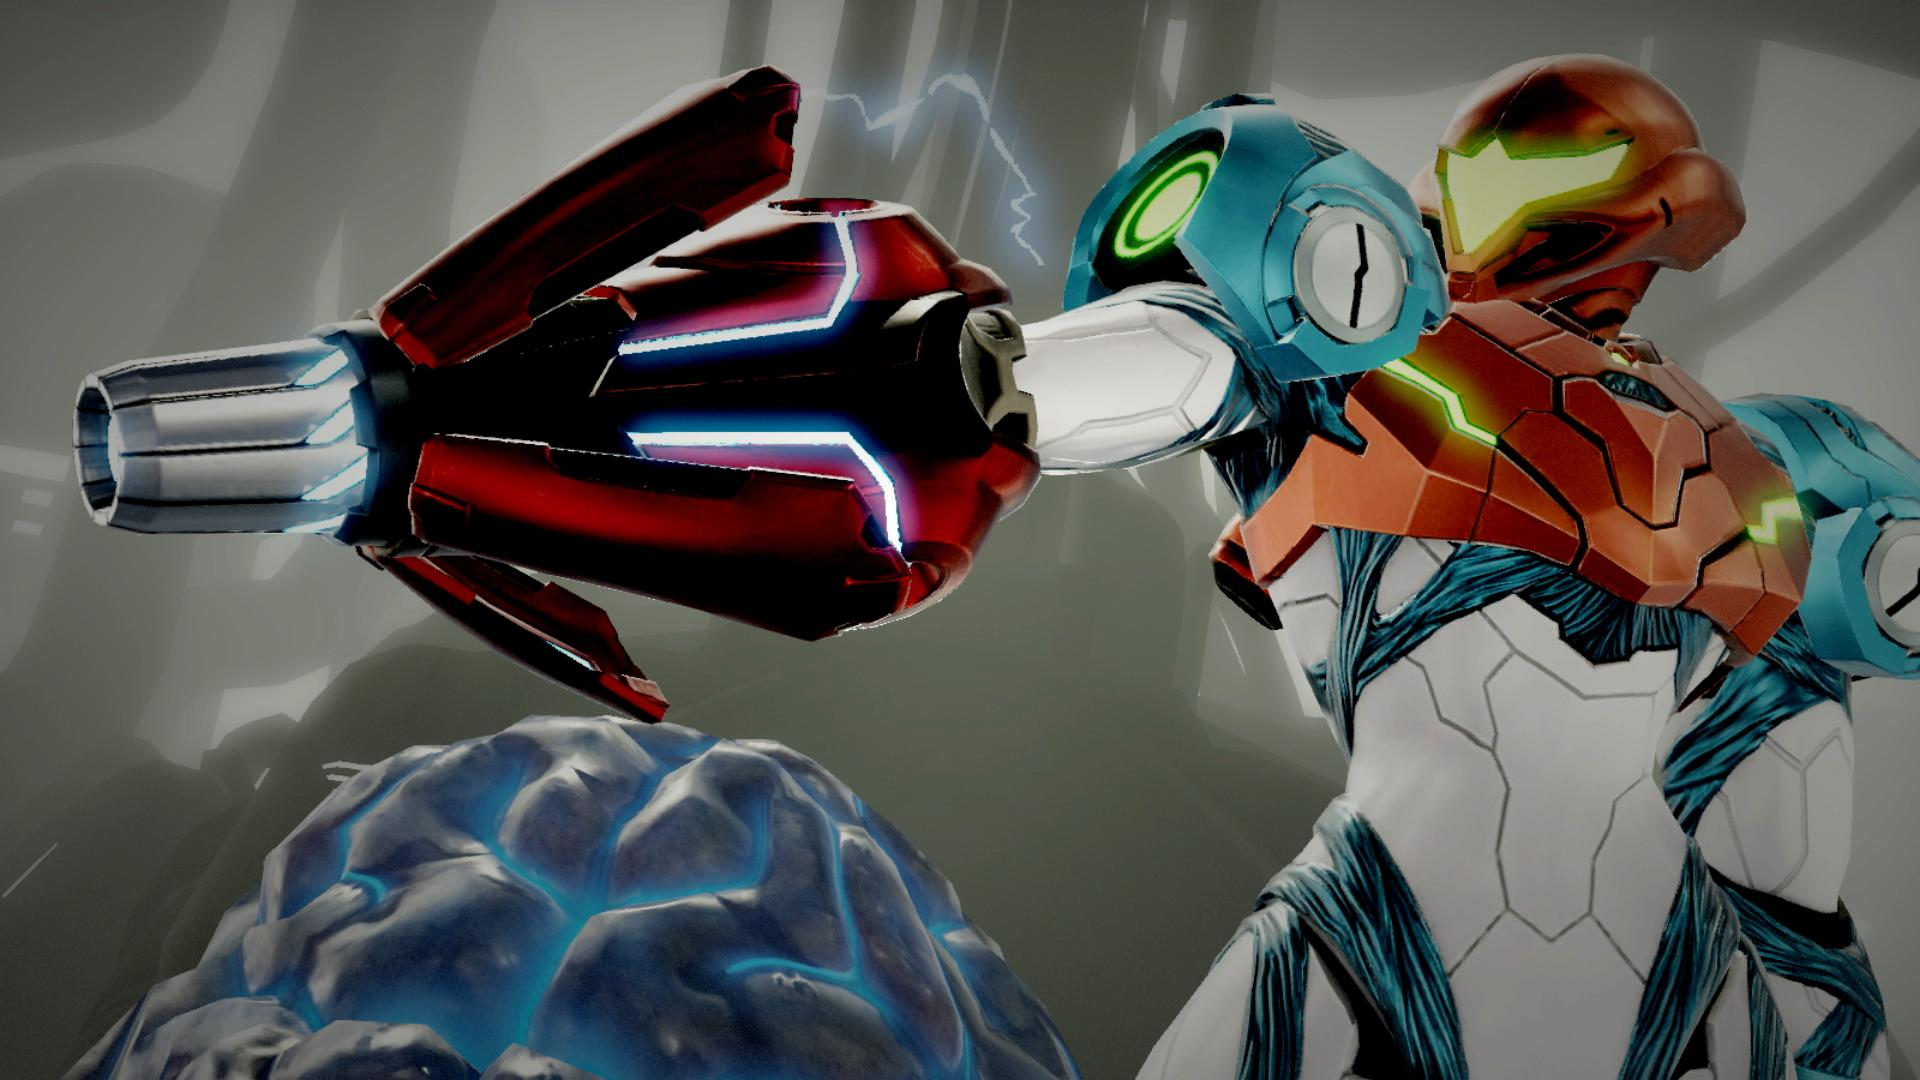 October - Metroid Dread